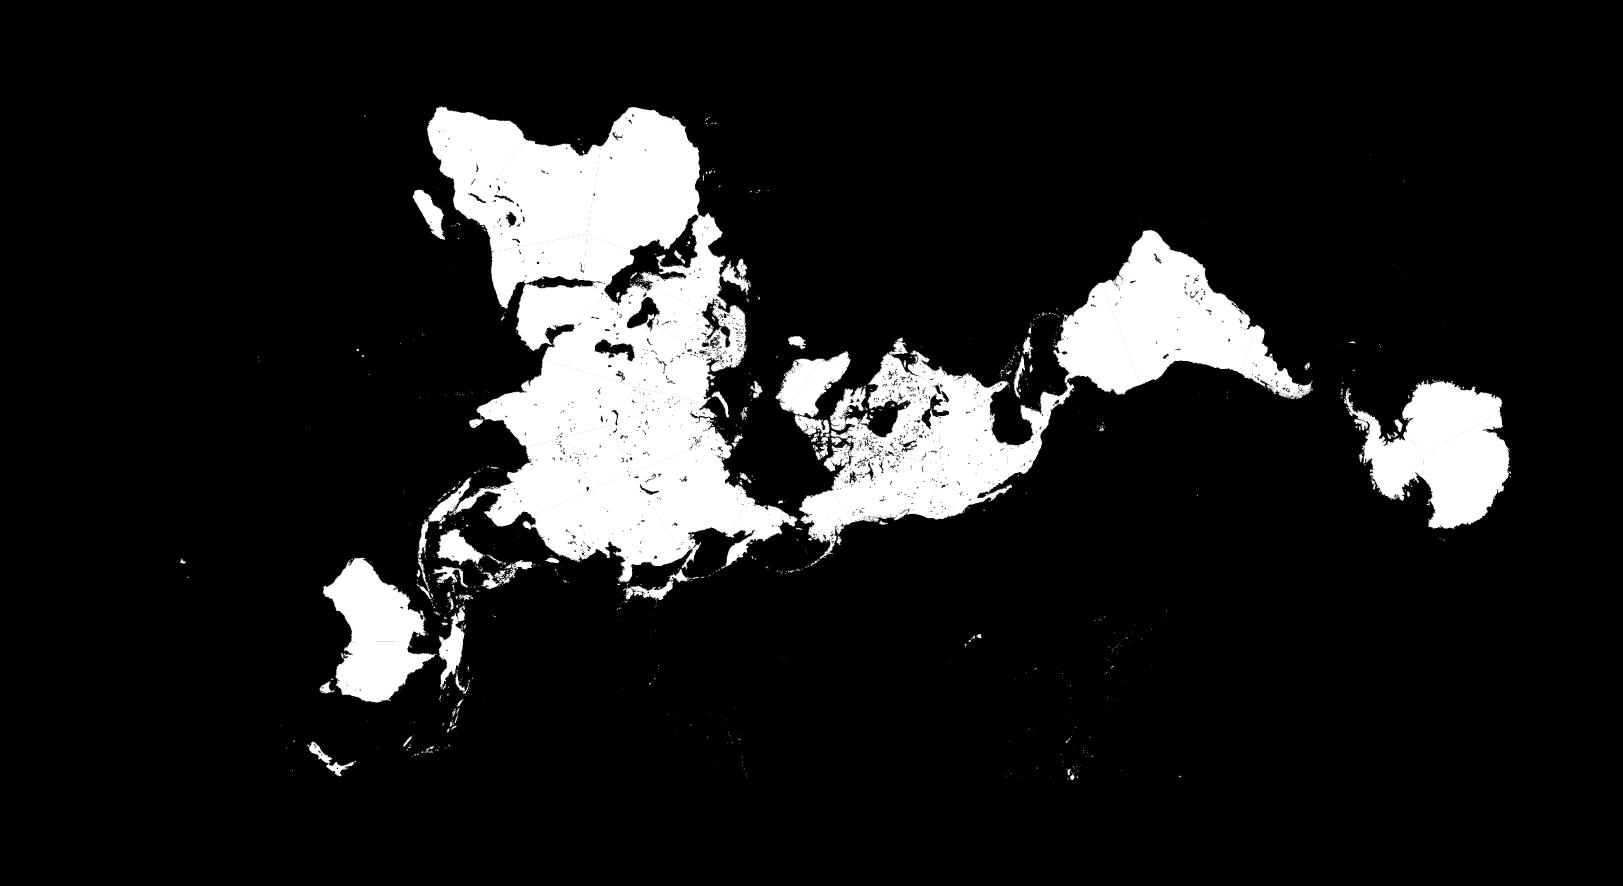 Buckminster fuller dymaxion map posters pinterest buckminster fuller dymaxion map gumiabroncs Images